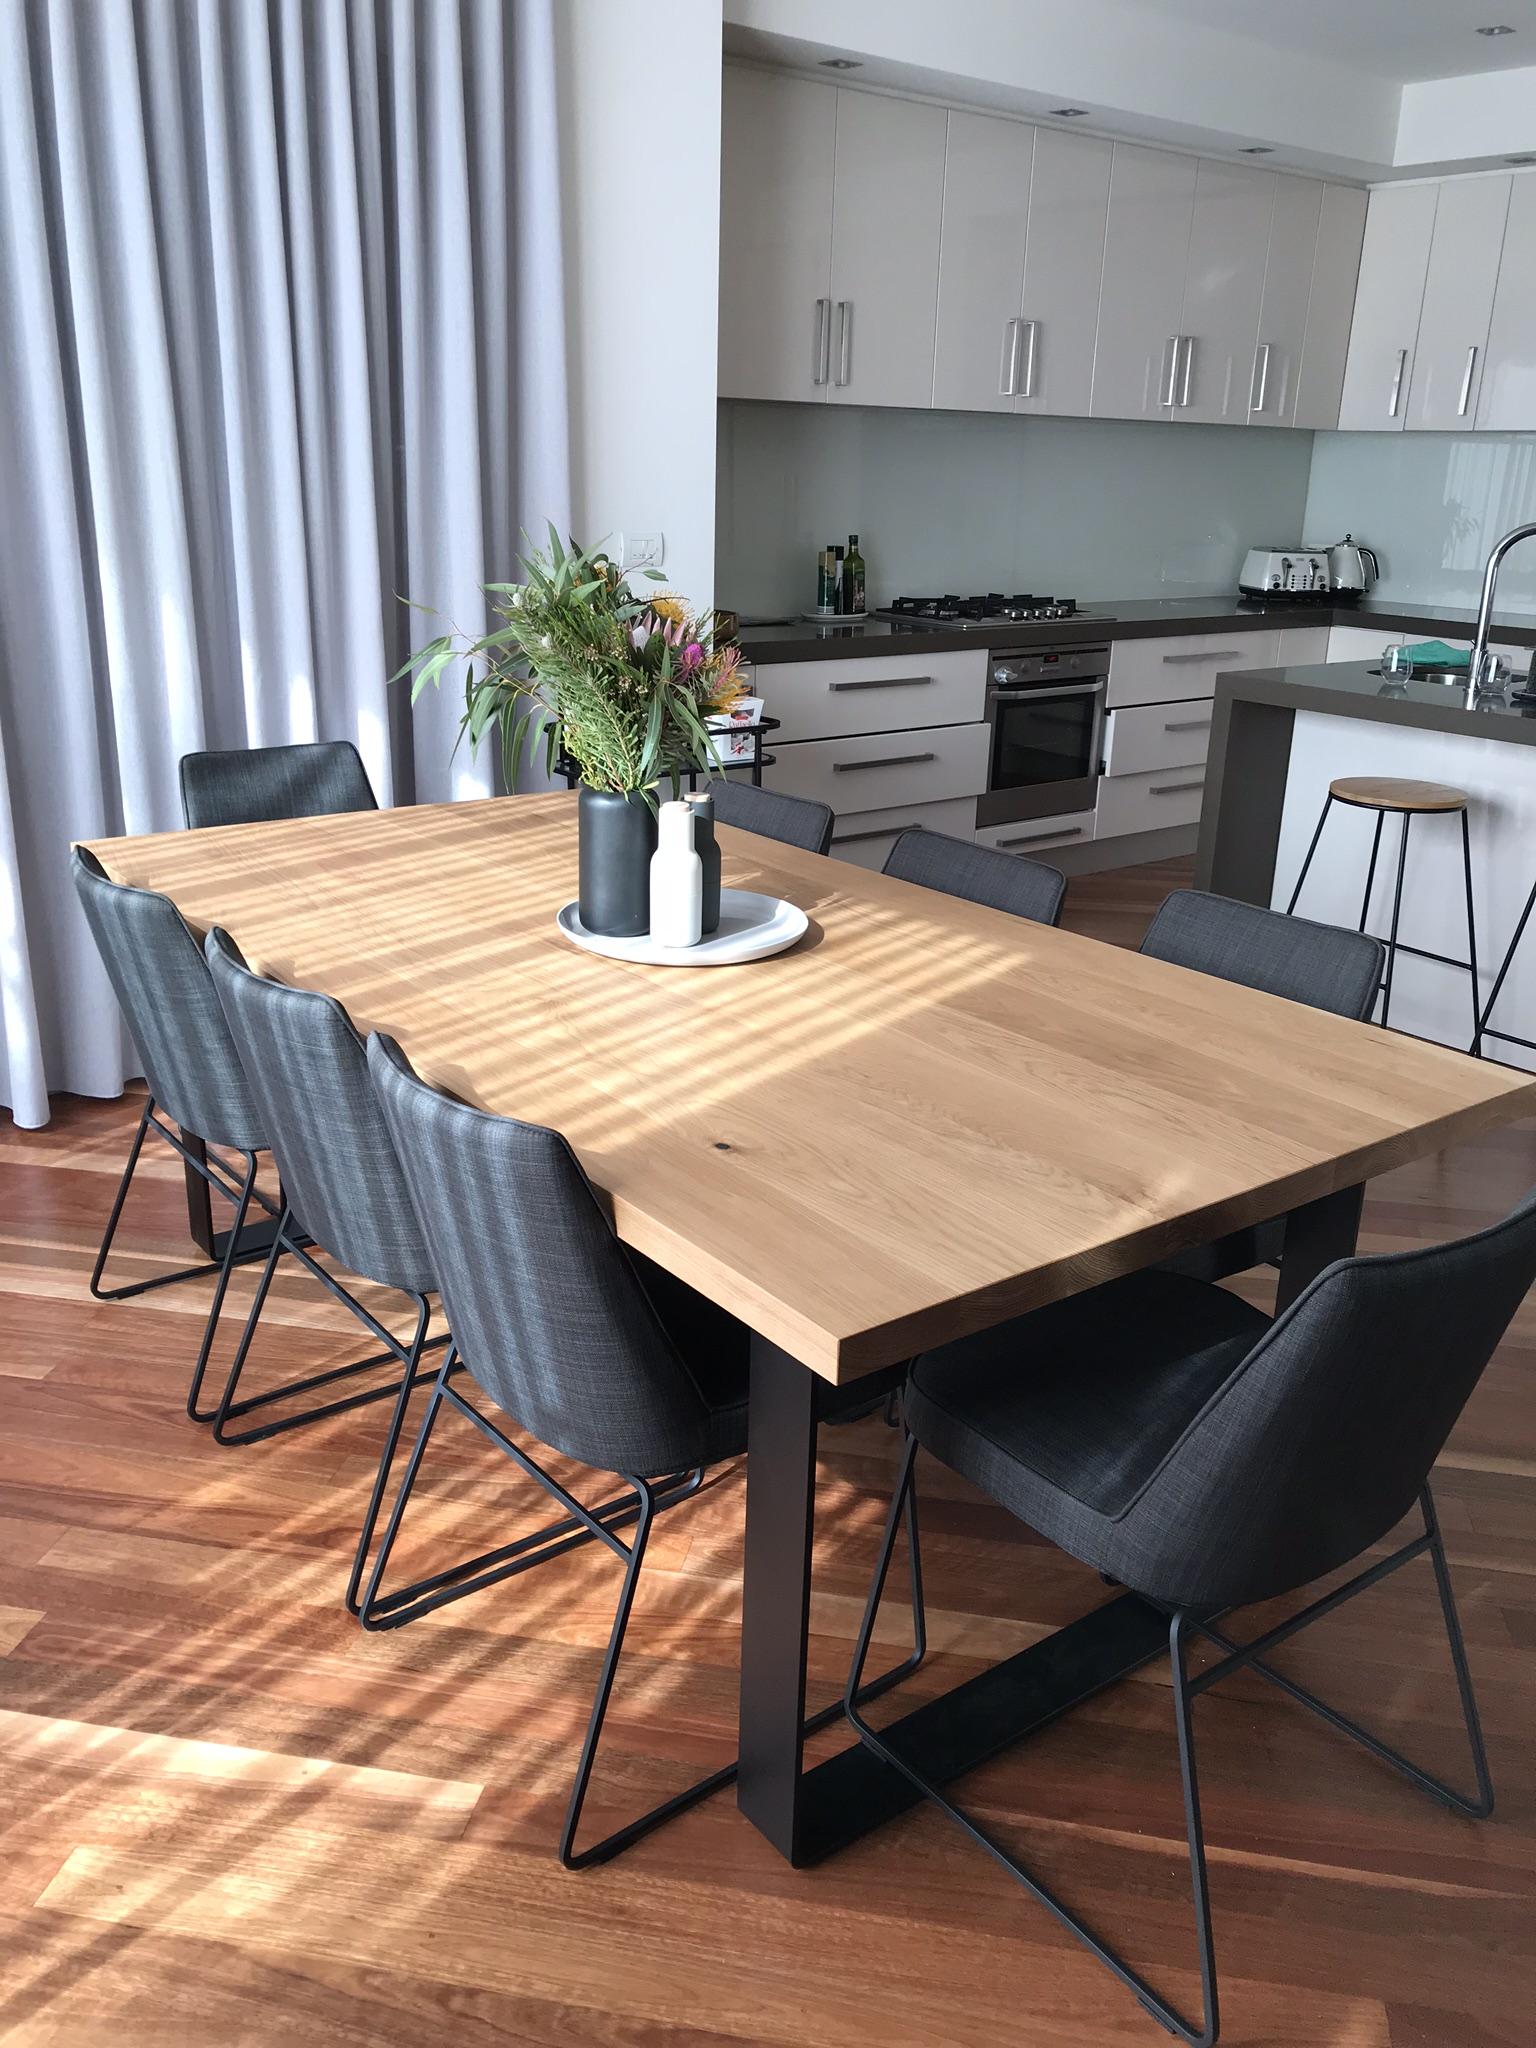 American Oak Dining Table.  //jrbespokedesigns.com.au/wp Content/uploads/2019/